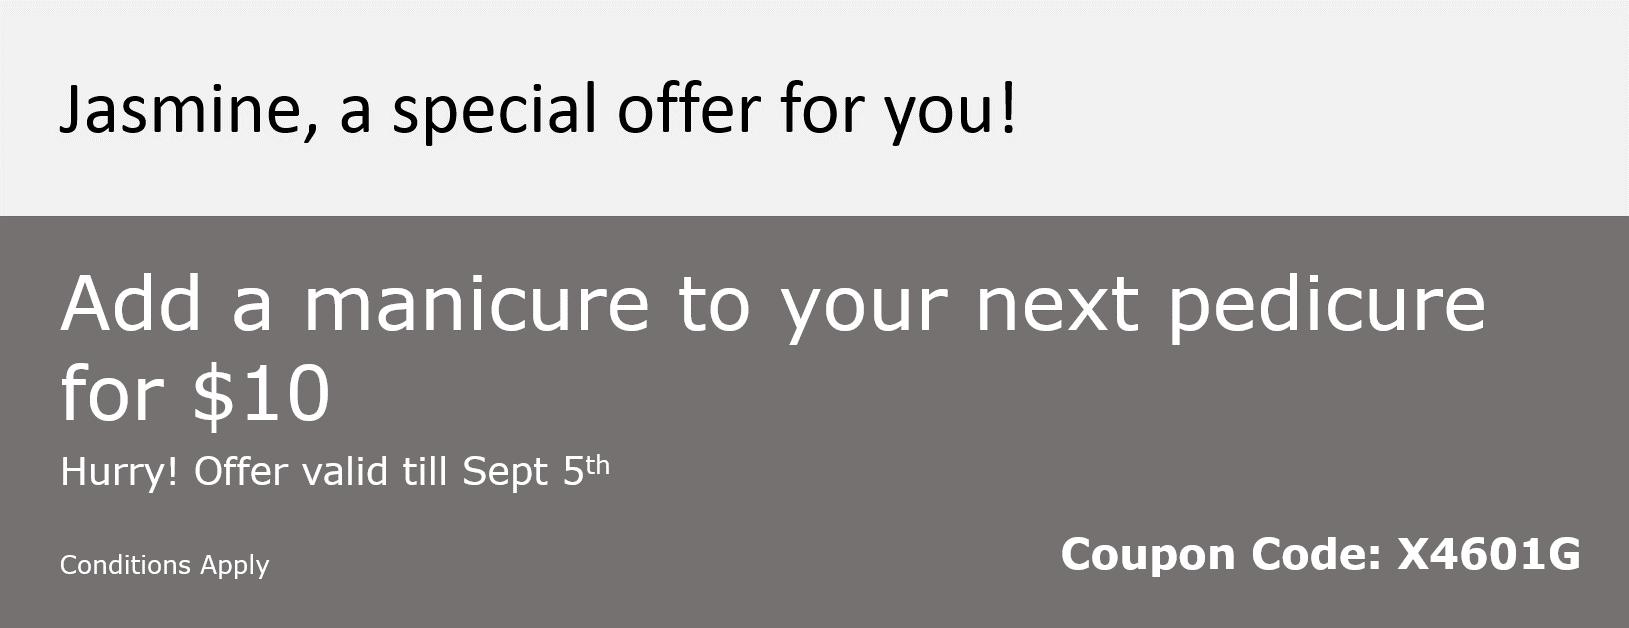 Custom Coupon - Cross sell service